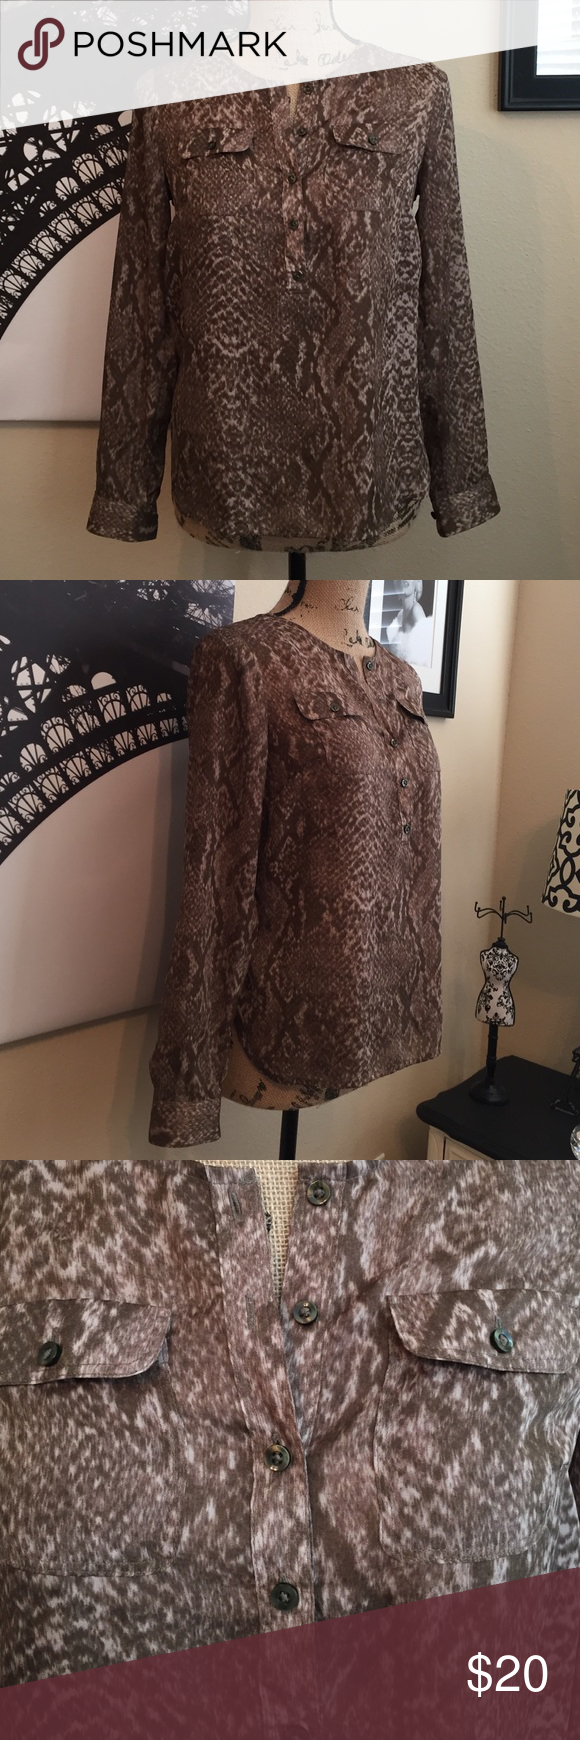 Ann Taylor LOFT Size XSP Love the print on this shirt. Ann Taylor Tops Blouses